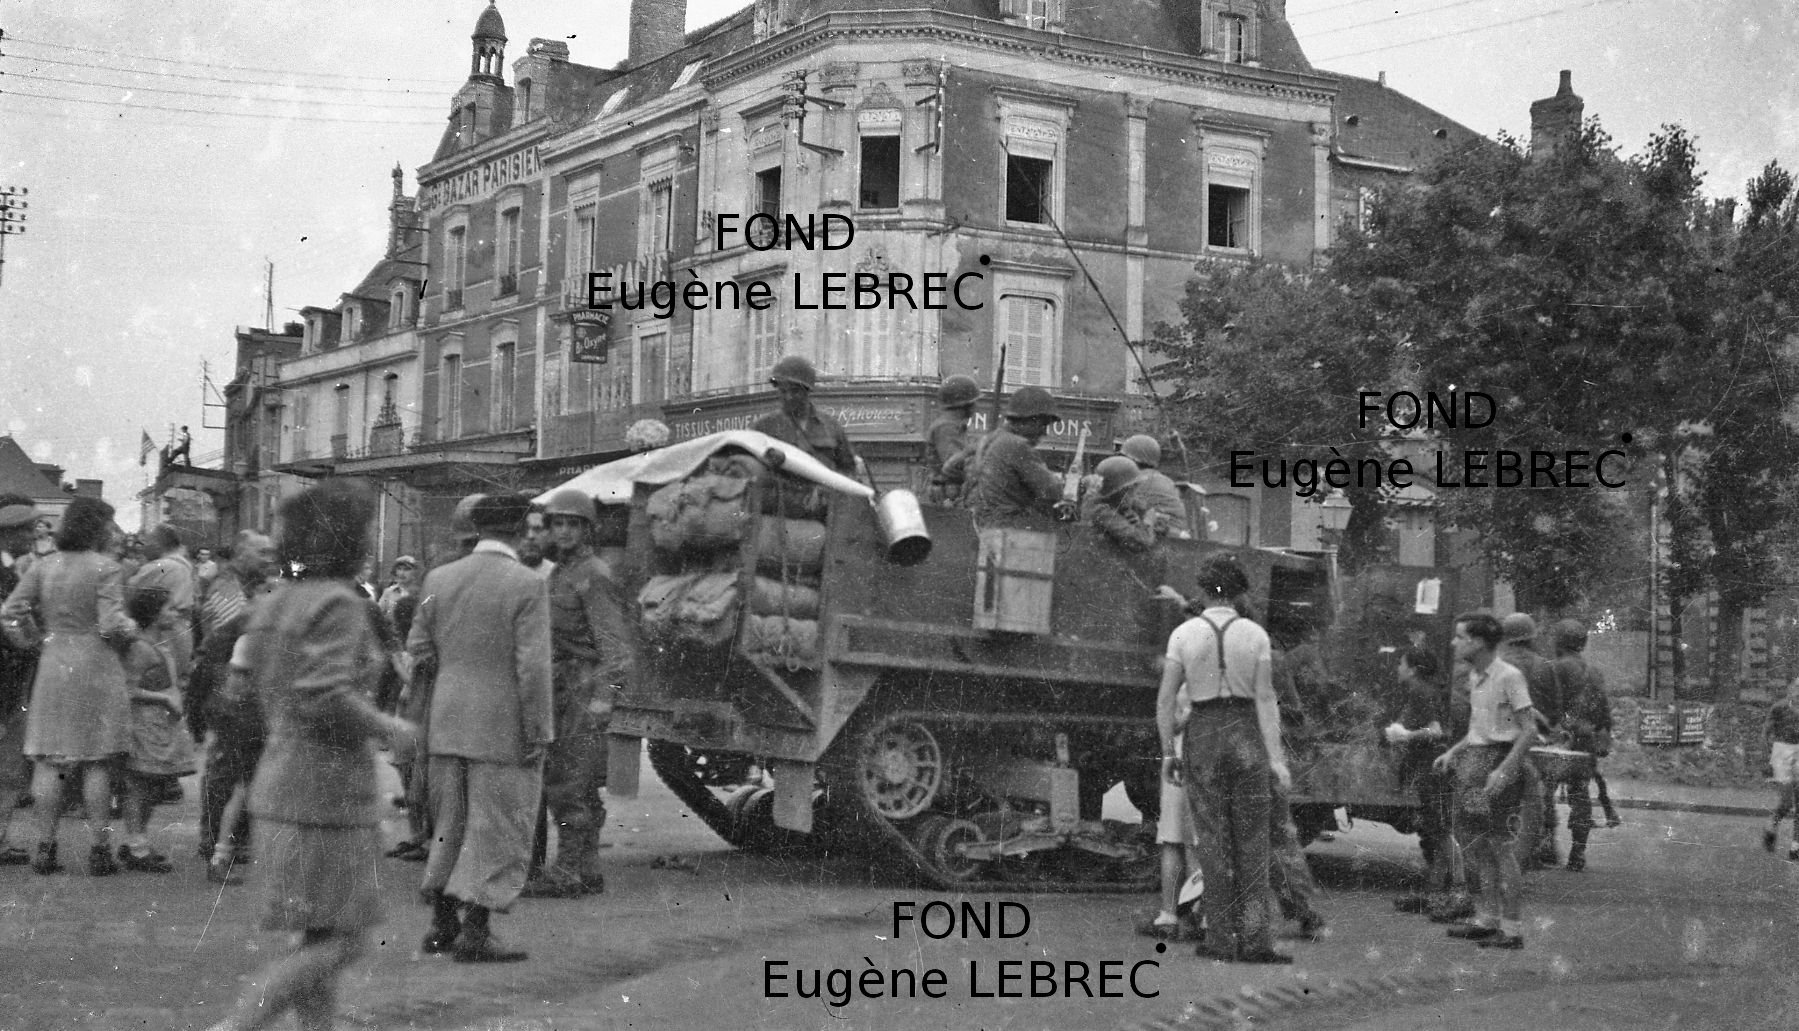 Chateau Gontier (Mayenne), véhicules à identifier - Page 3 86149410